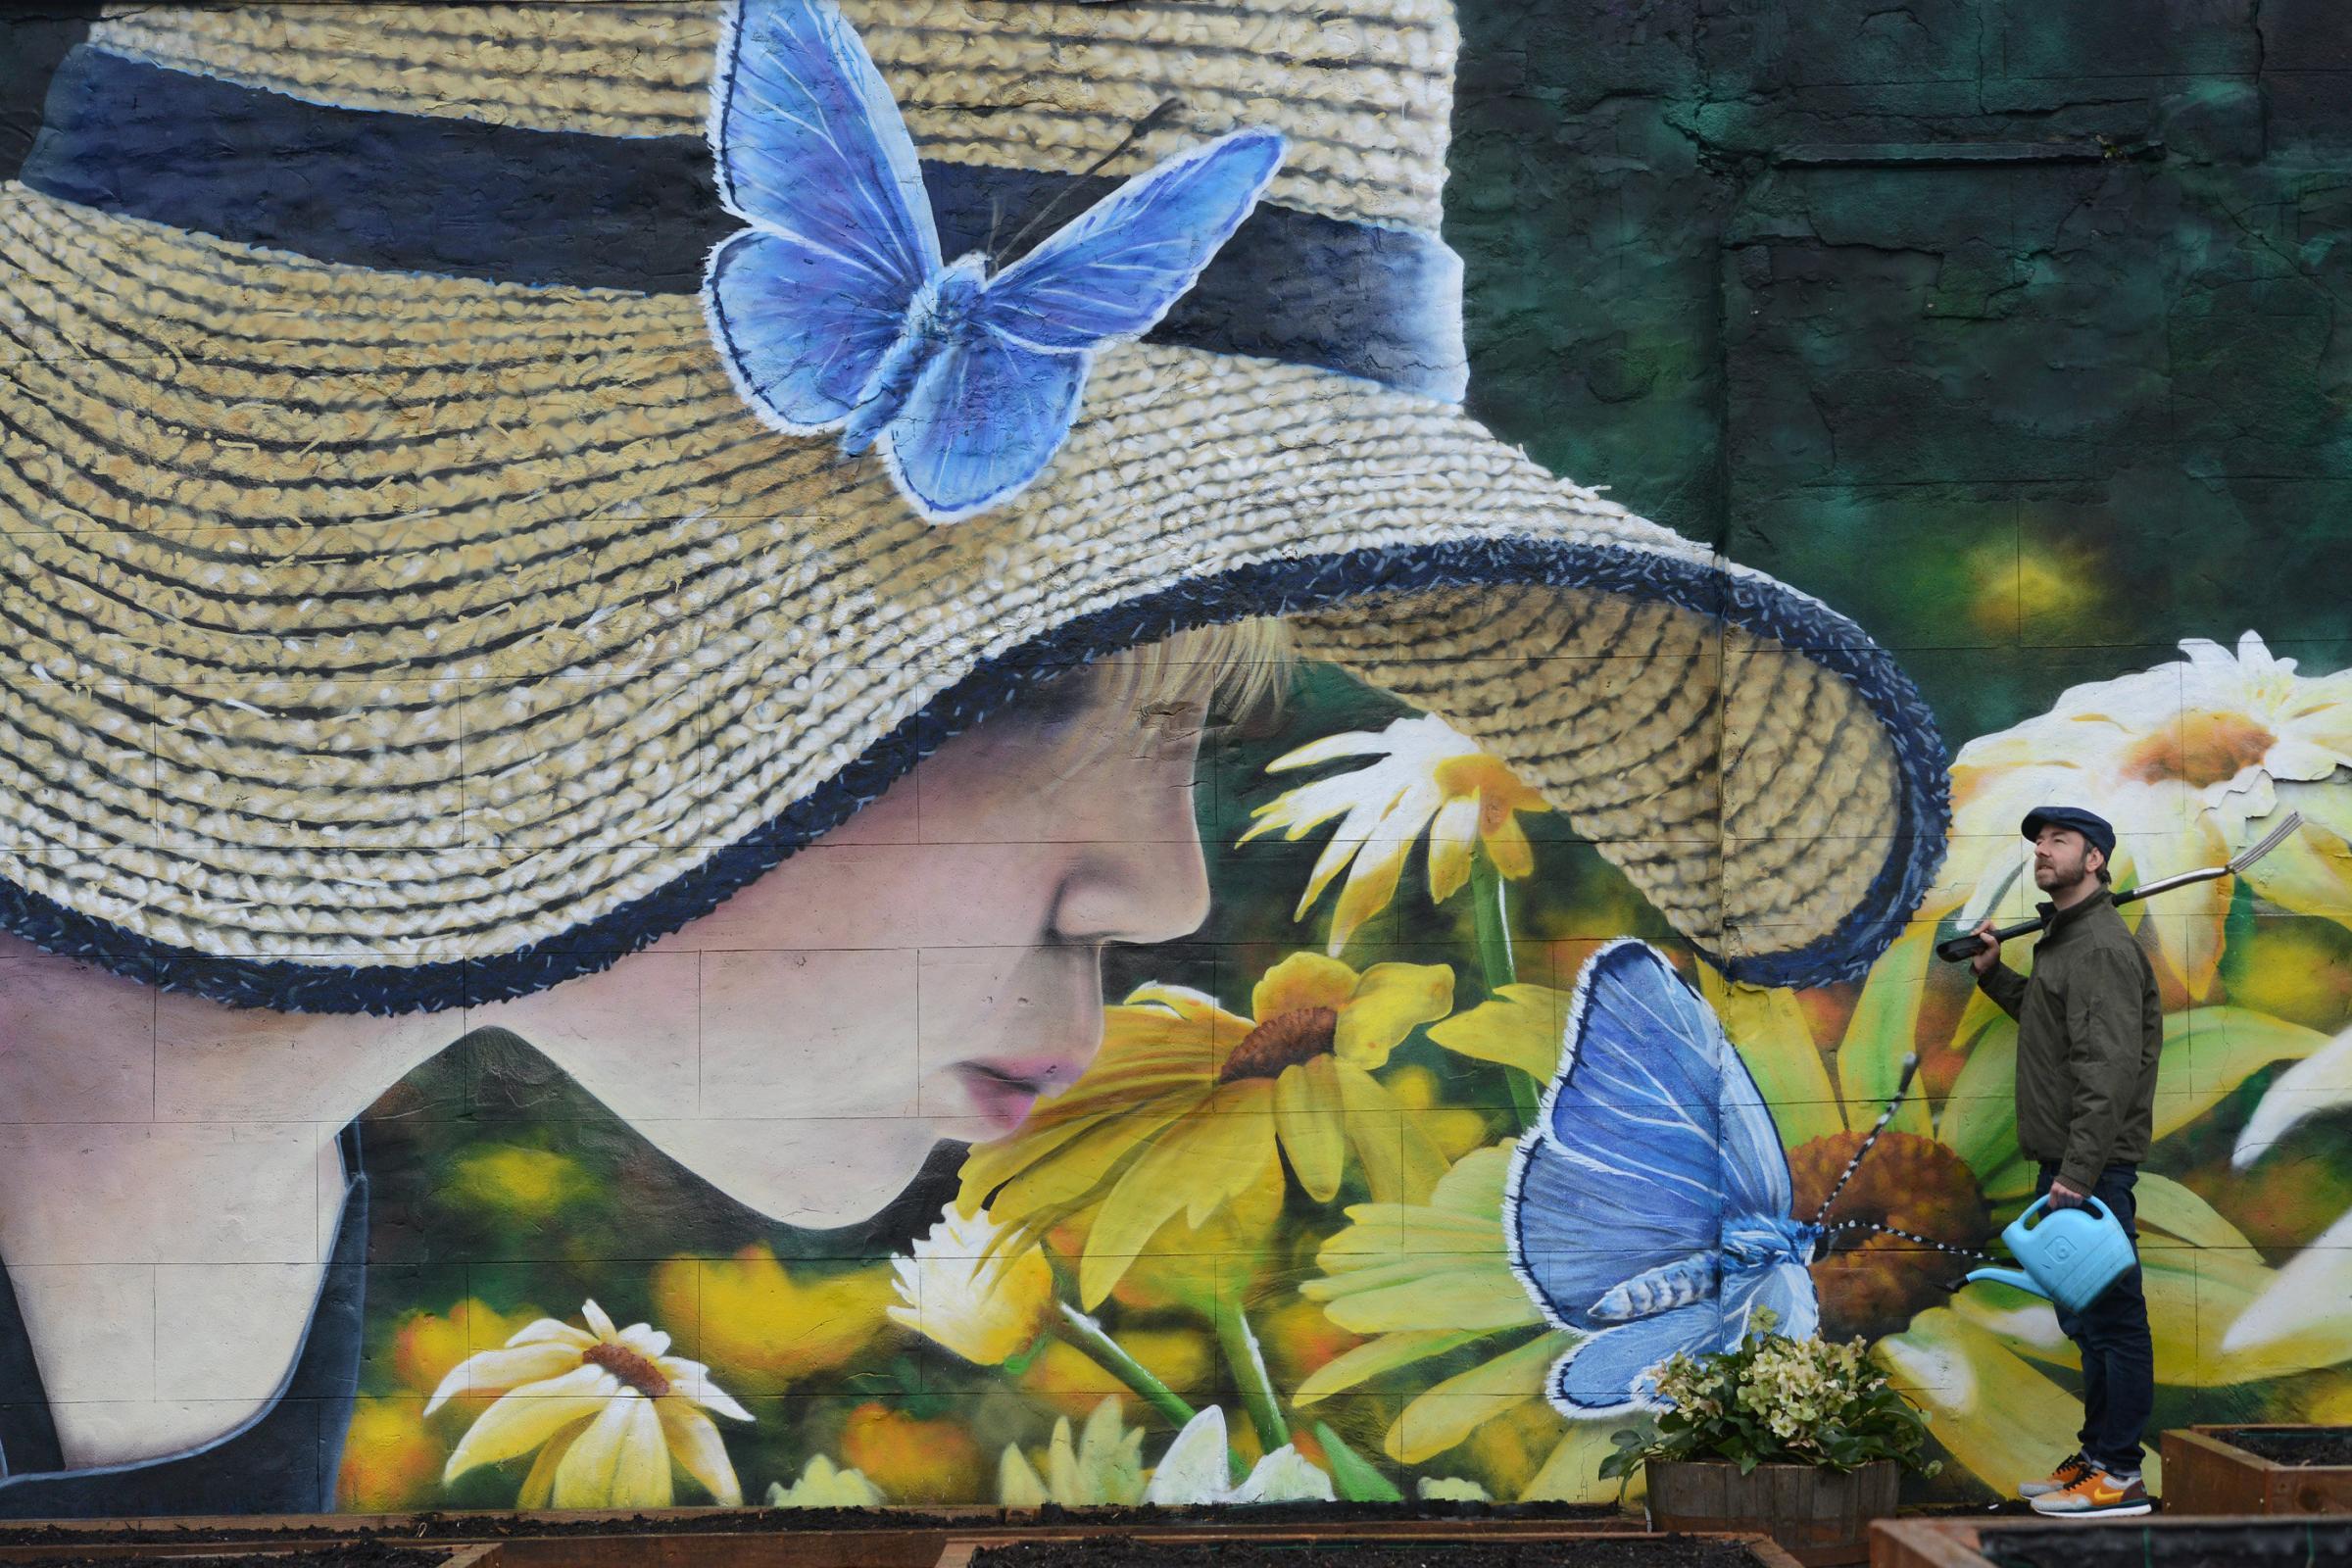 Street artist unveils new work at Kinning Park community garden